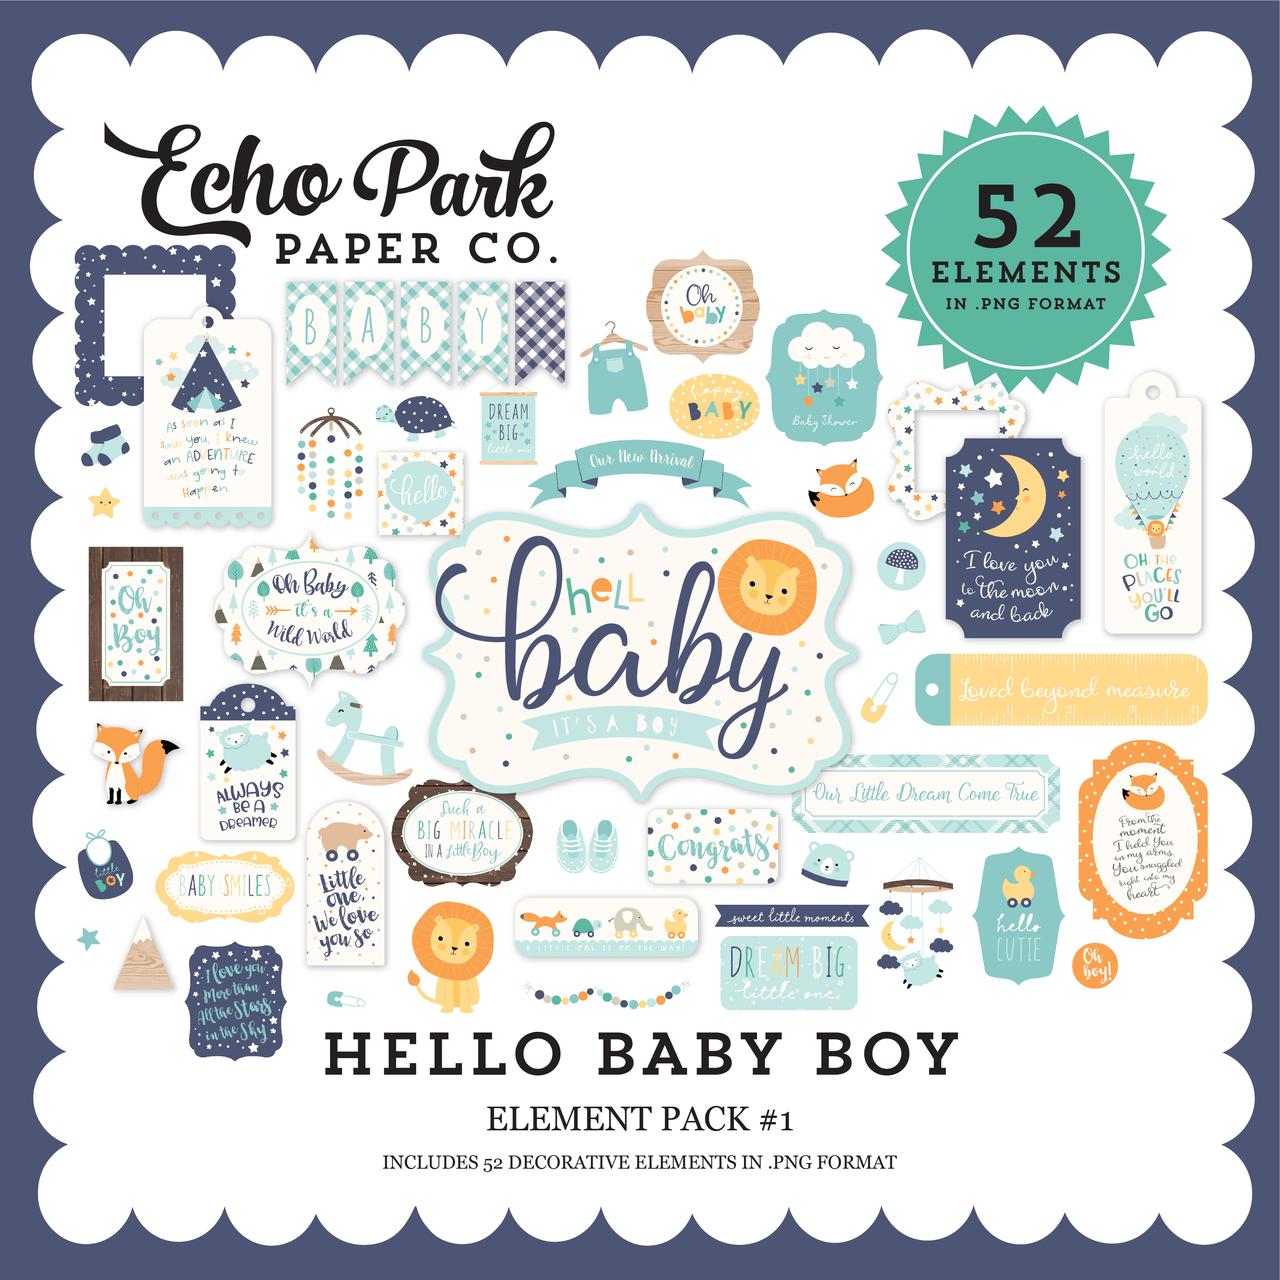 Hello Baby Boy Element Pack #1